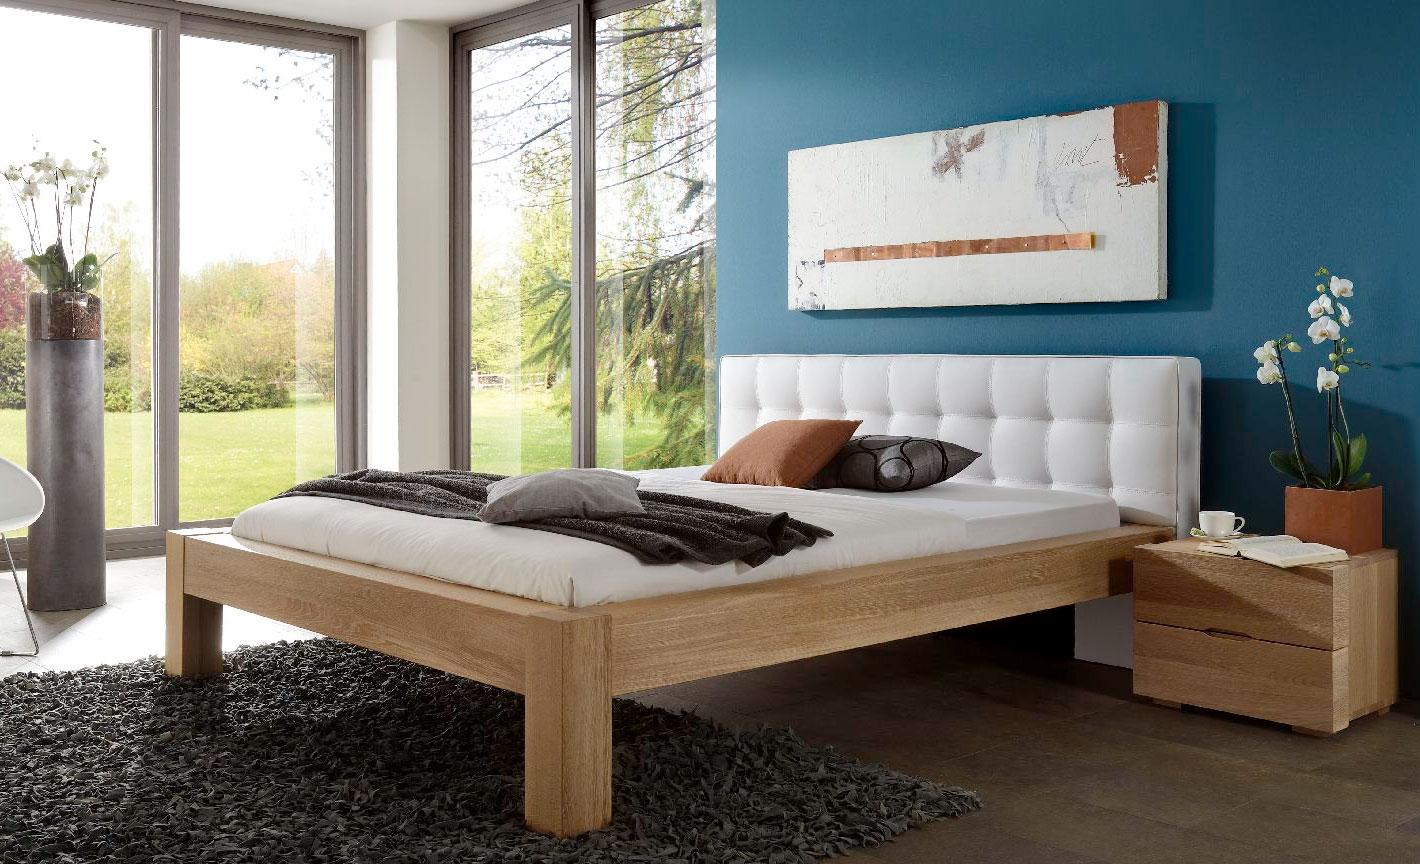 Dico Select Holzbett massiv mit Polsterkopfteil